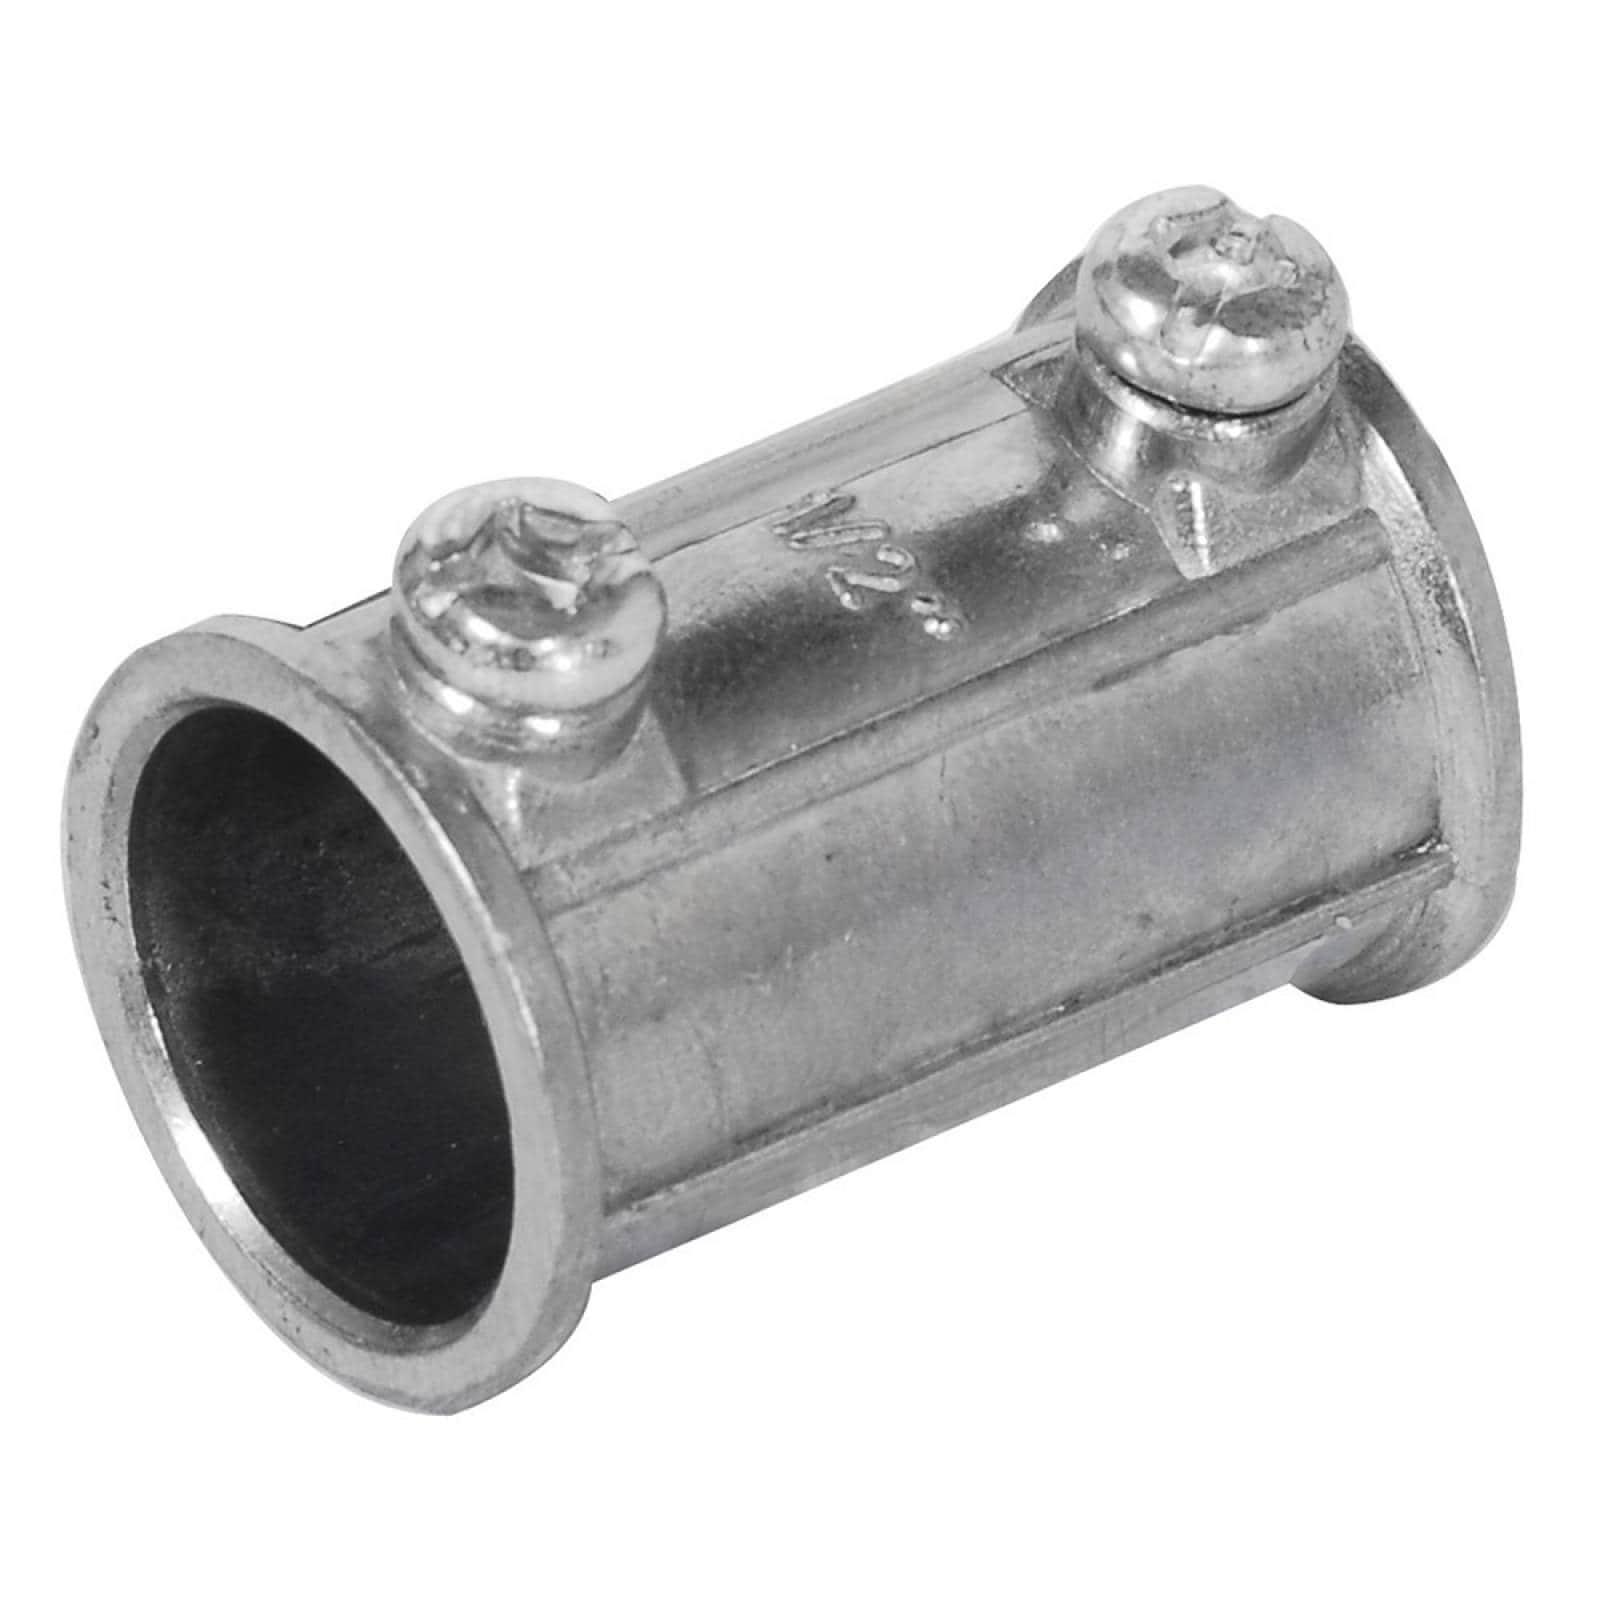 "Cople para tubo conduit de pared delgada 1/2"" 136828 Surtek"